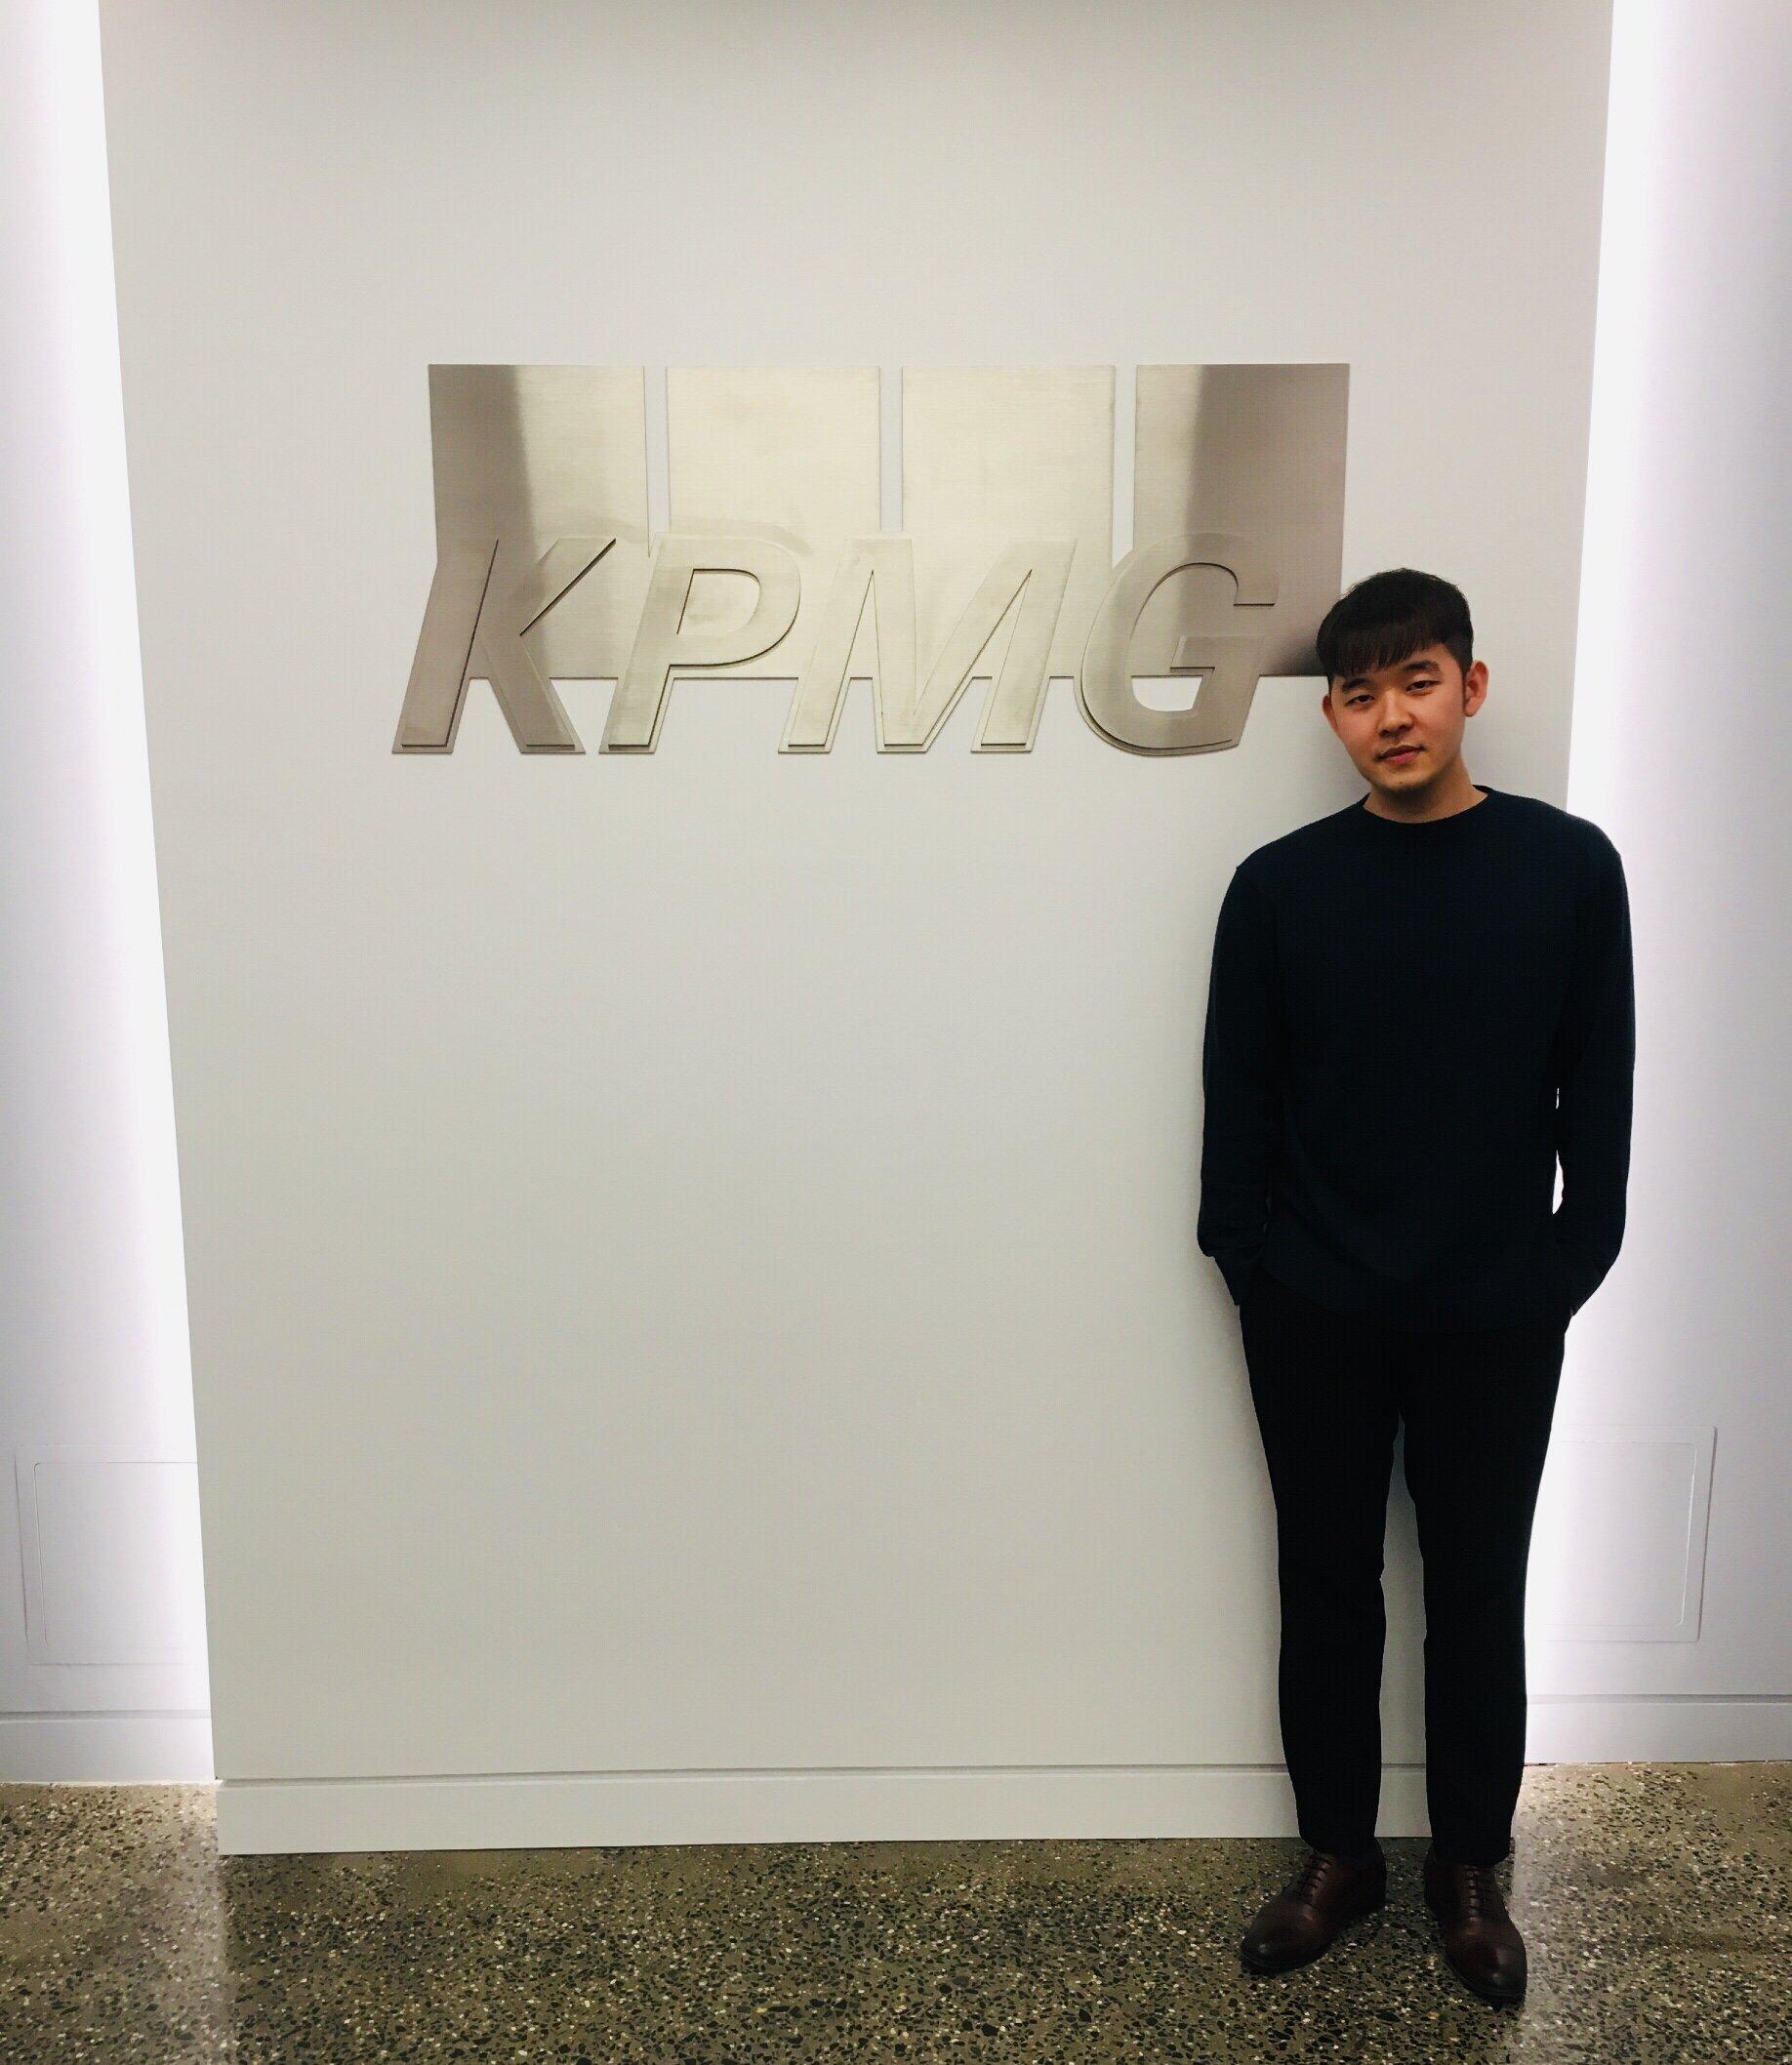 KPMG_James.jpg